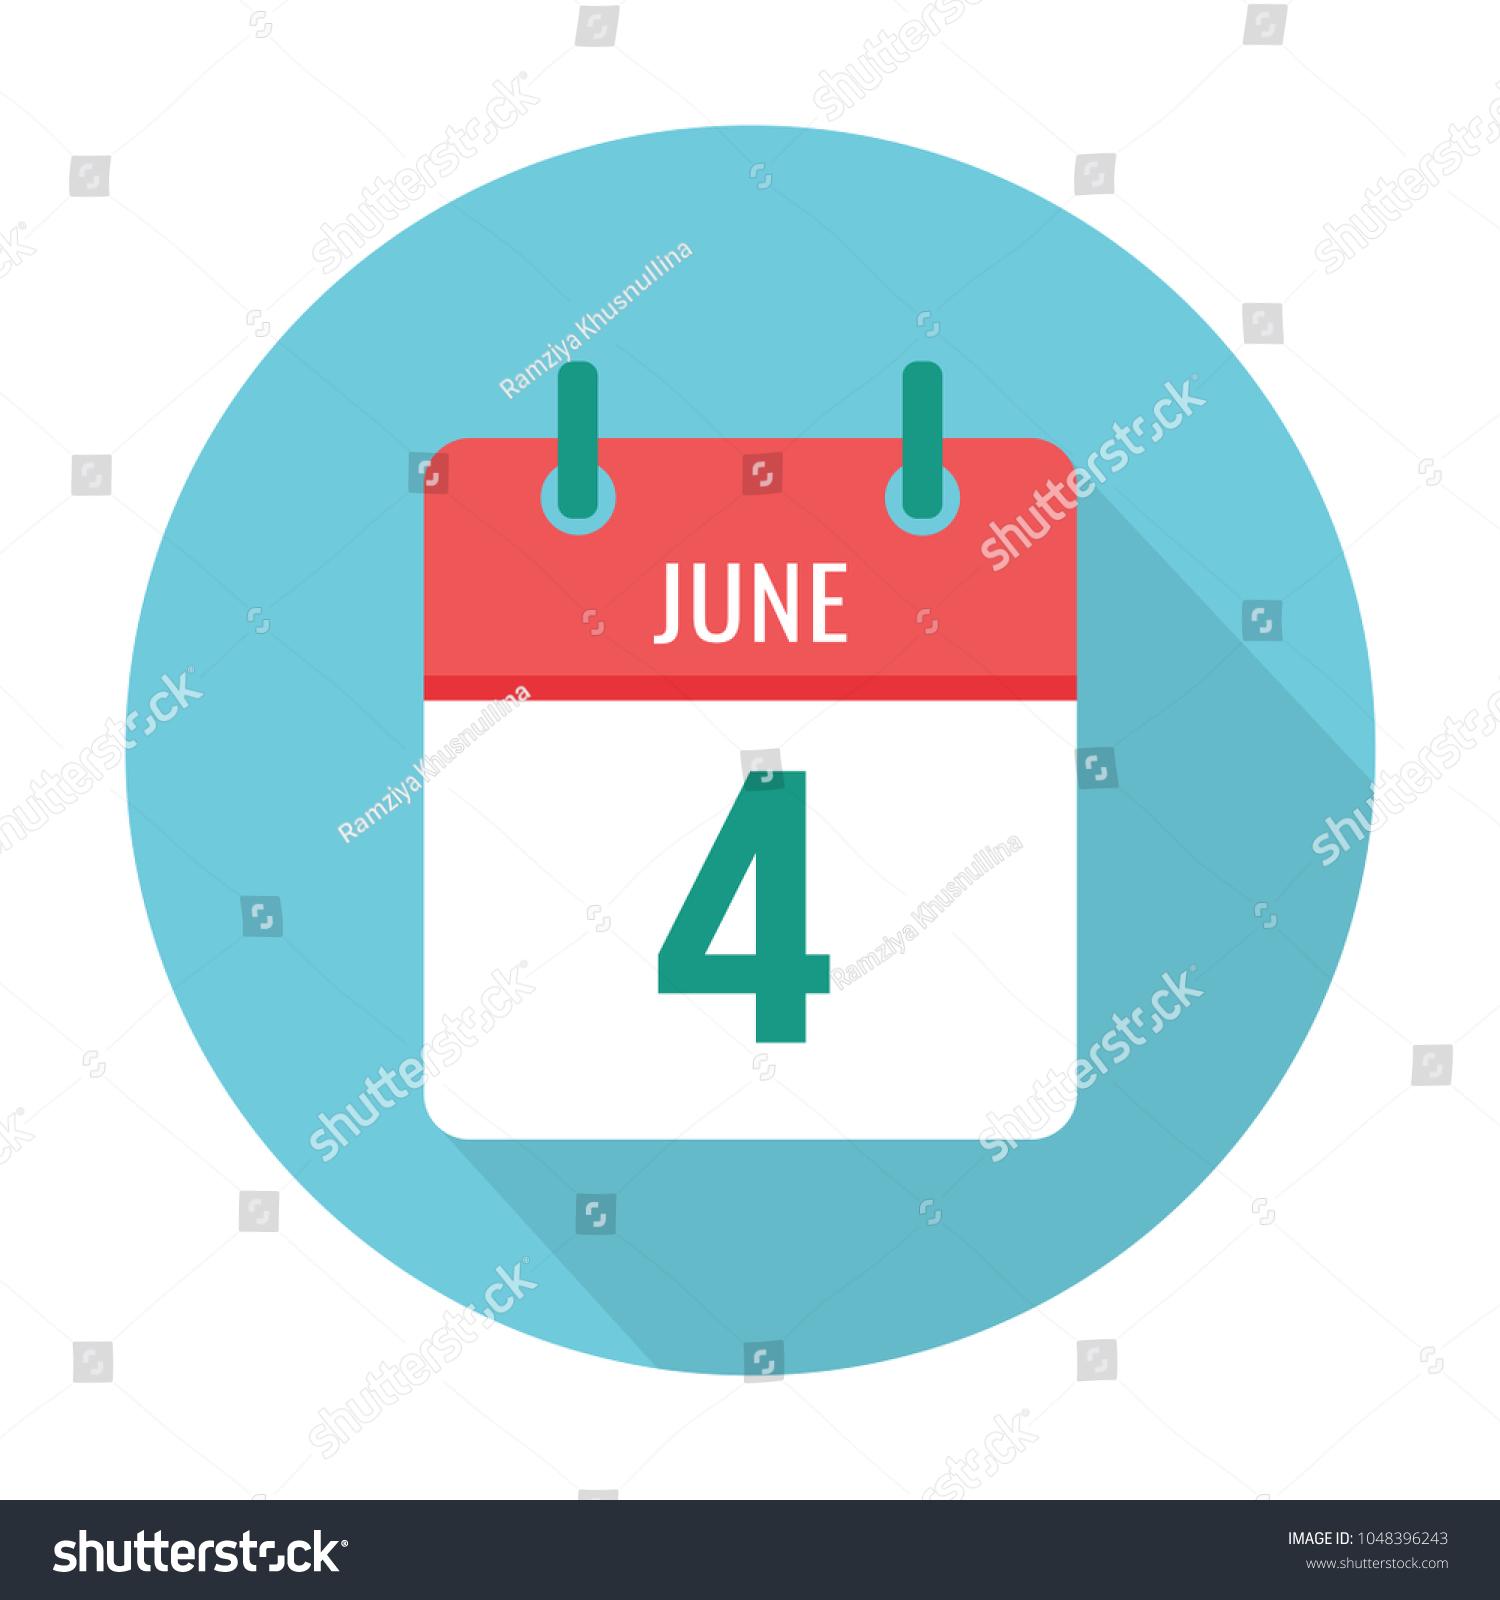 June 4 calendar icon flat international stock vector 1048396243 june 4 calendar icon flat international day of innocent children crane operator foundation biocorpaavc Choice Image